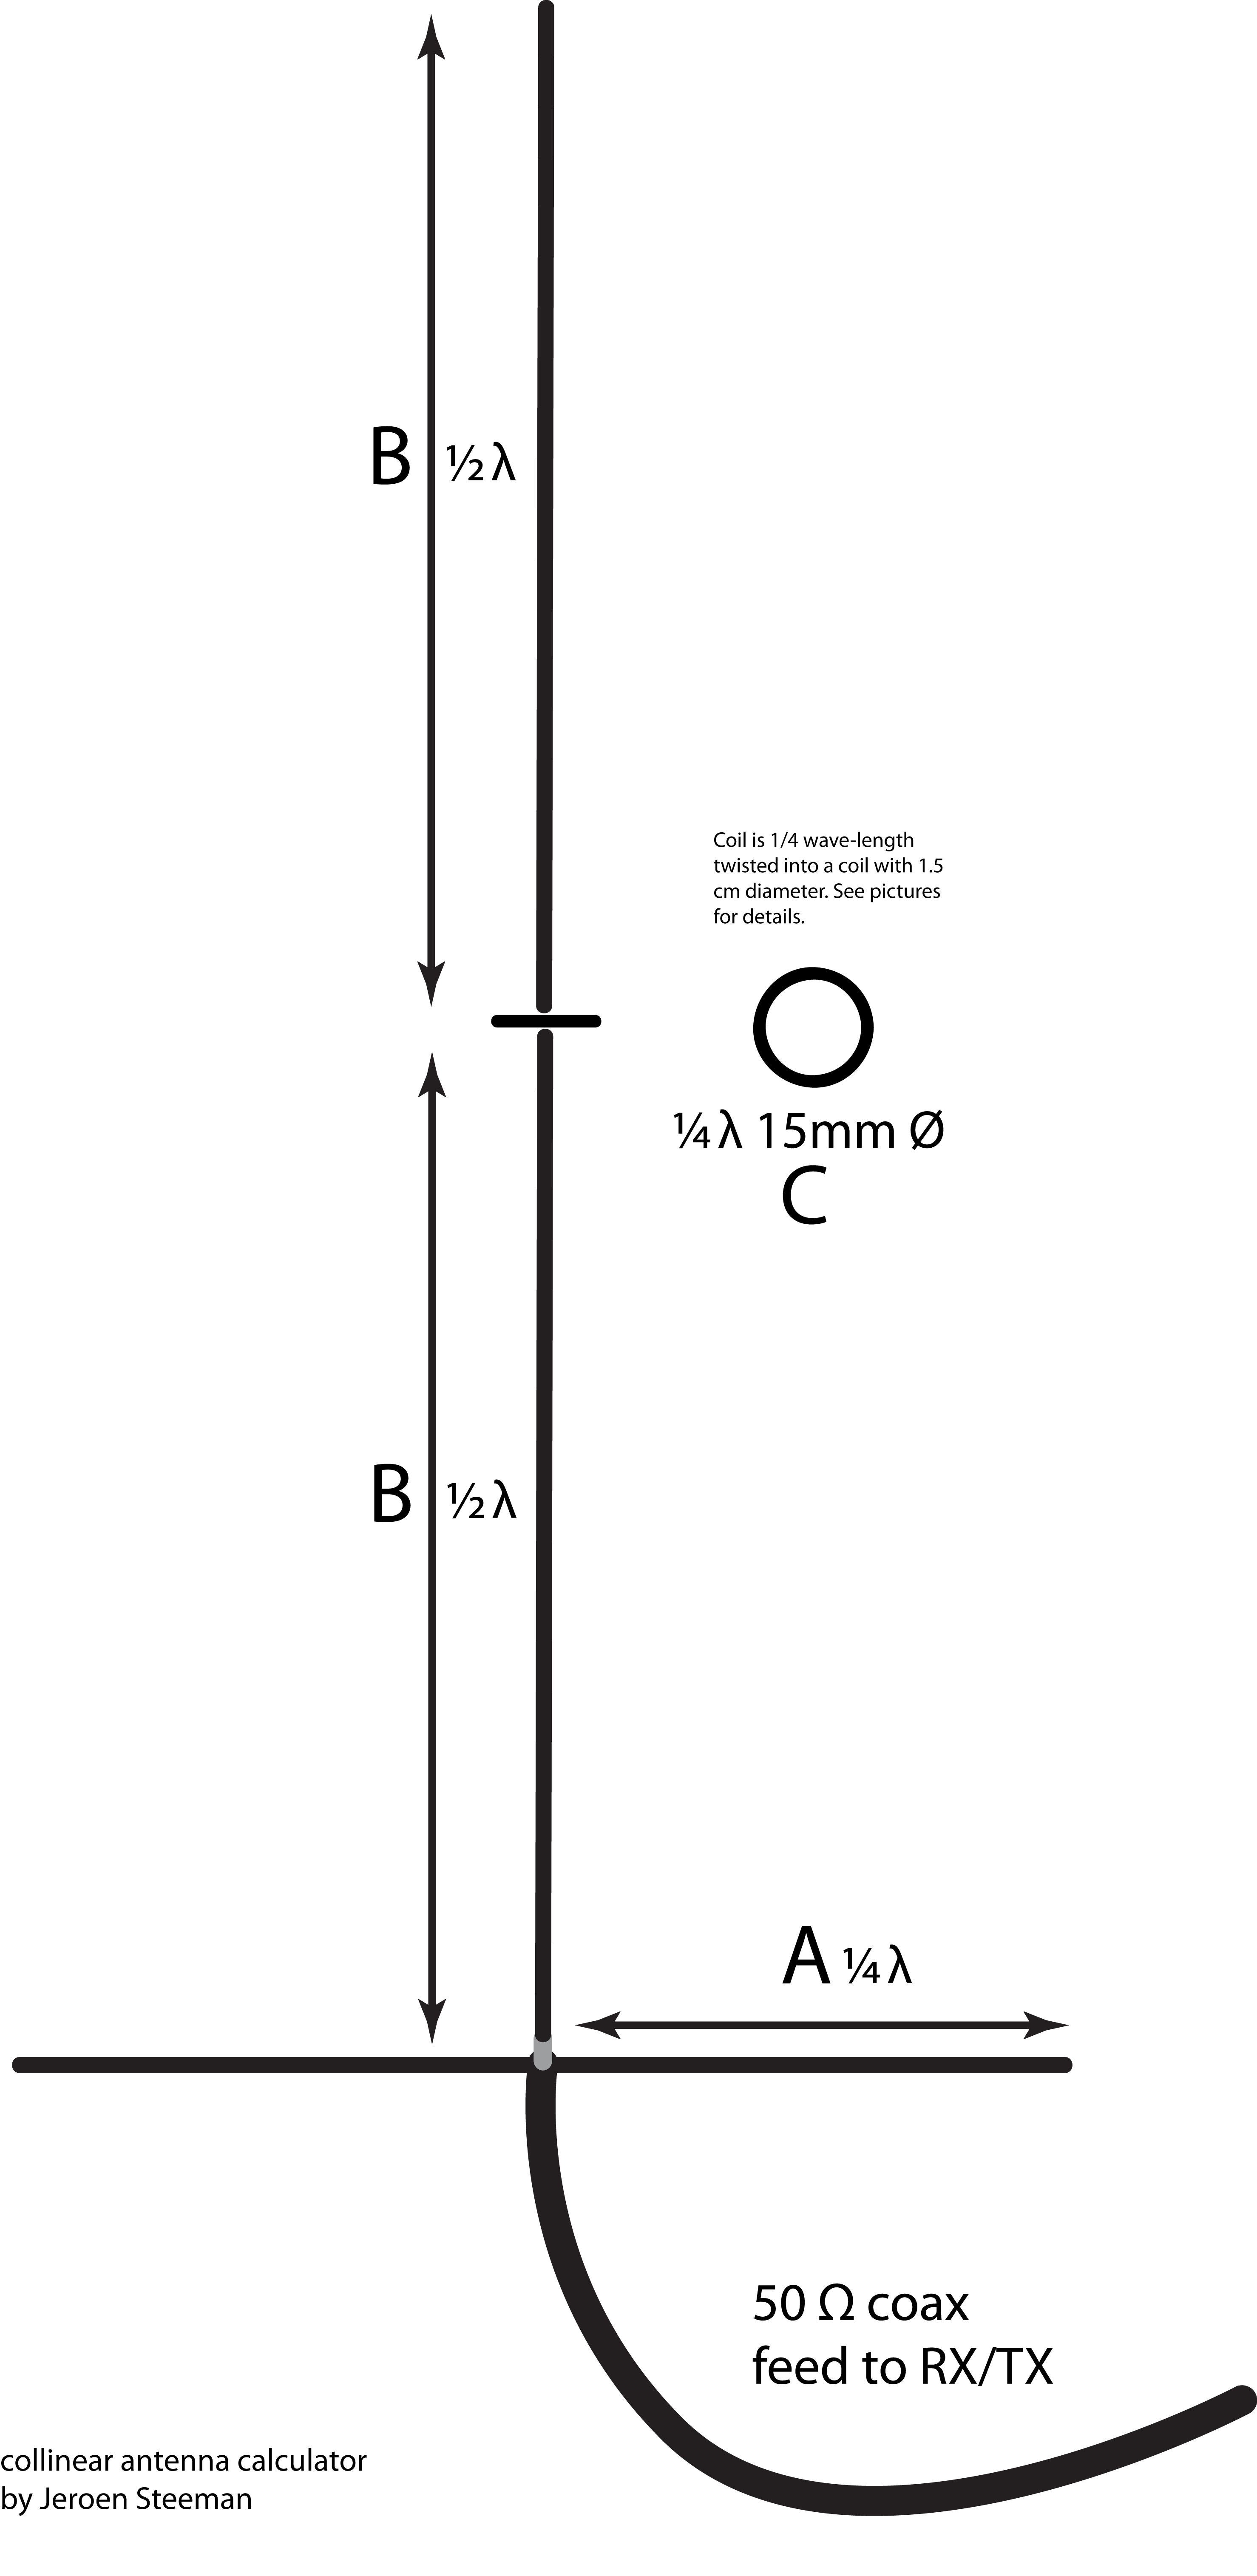 Collinear Dipole Antenna Design Calculator